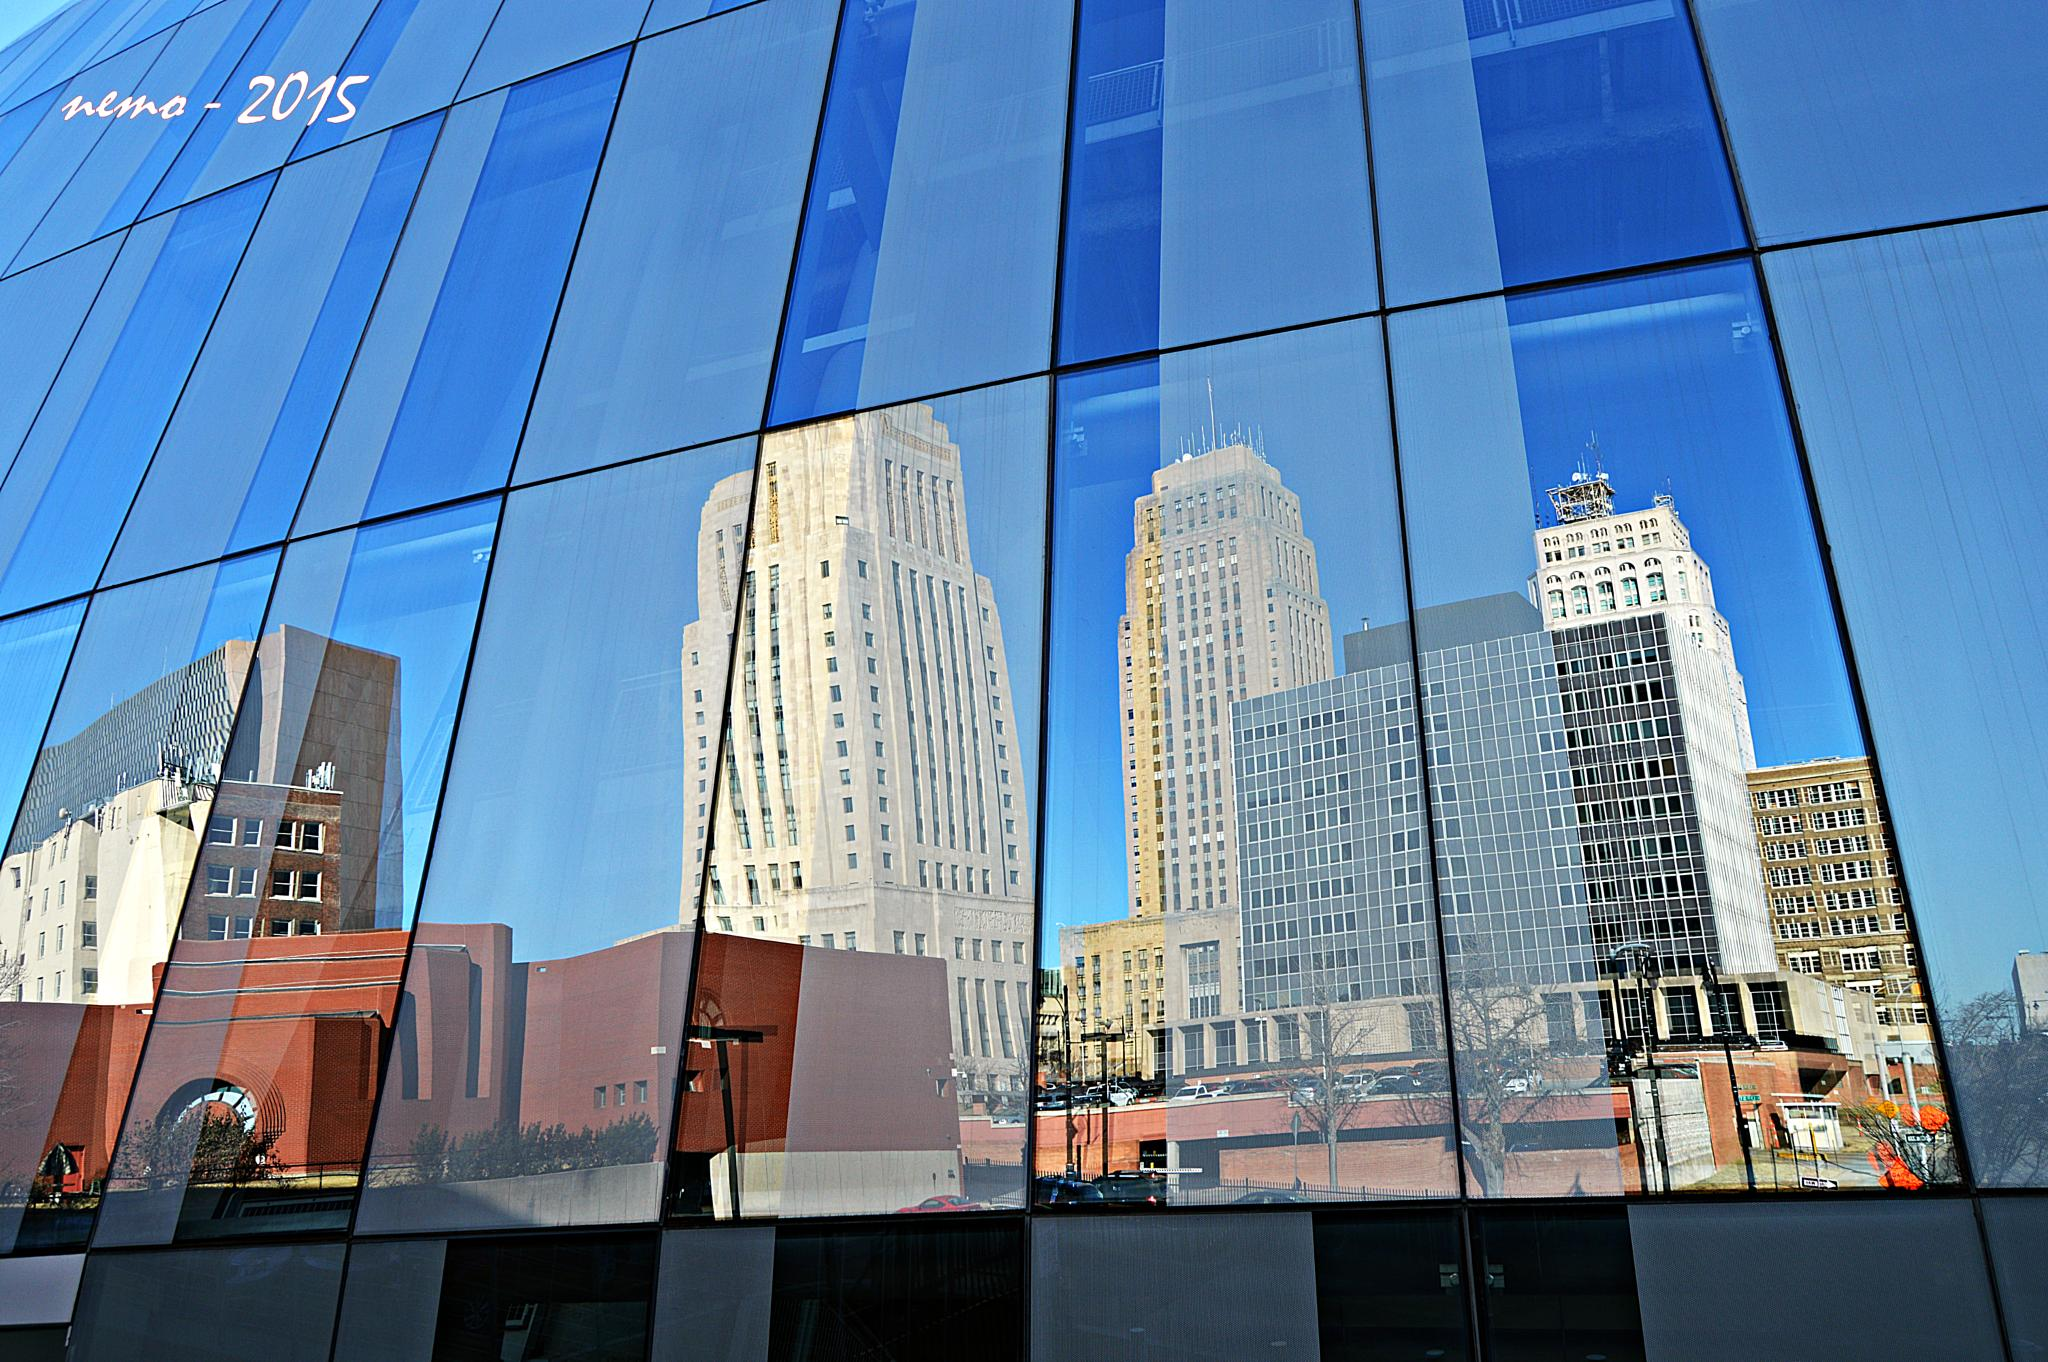 Cityscape Reflections 2 by Nemo